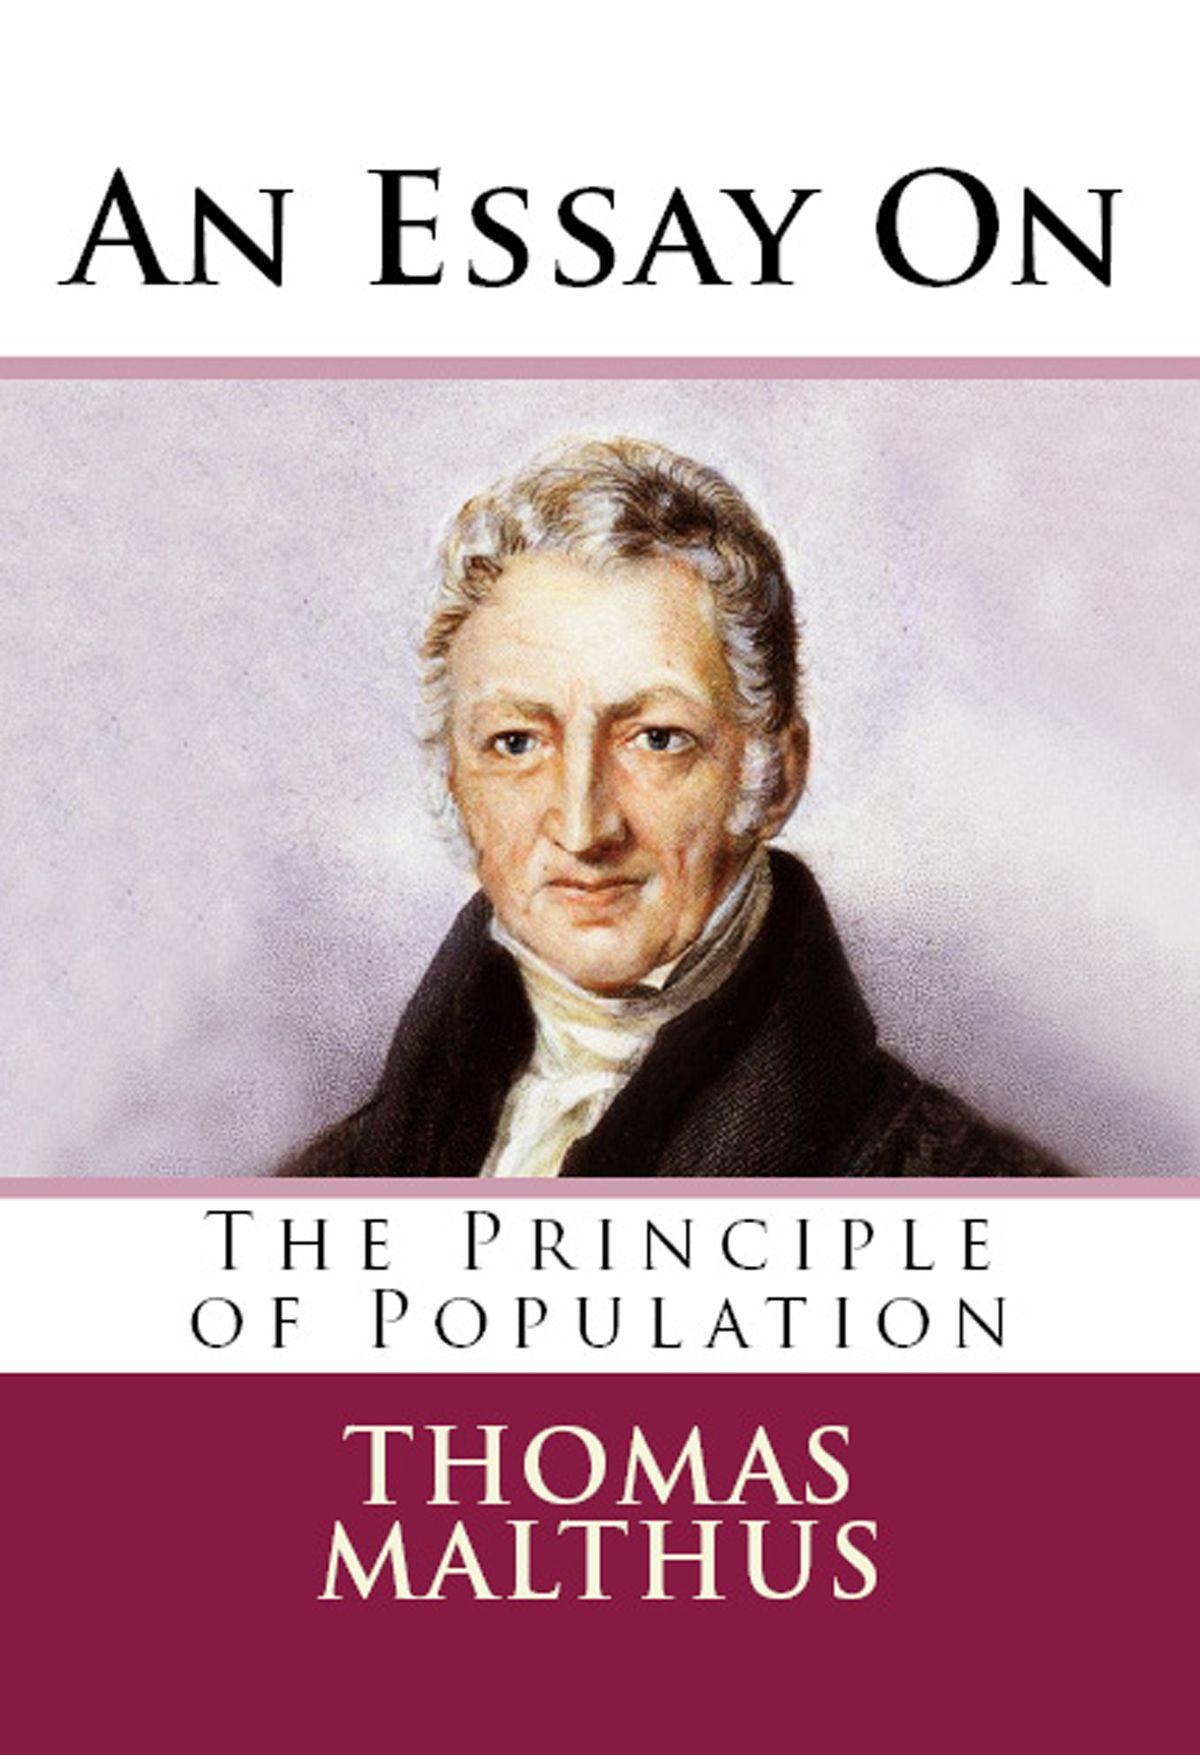 024 Essay Example An On The Principle Of Population Thomas Stupendous Malthus After Reading Malthus's Principles Darwin Got Idea That Ap Euro Full